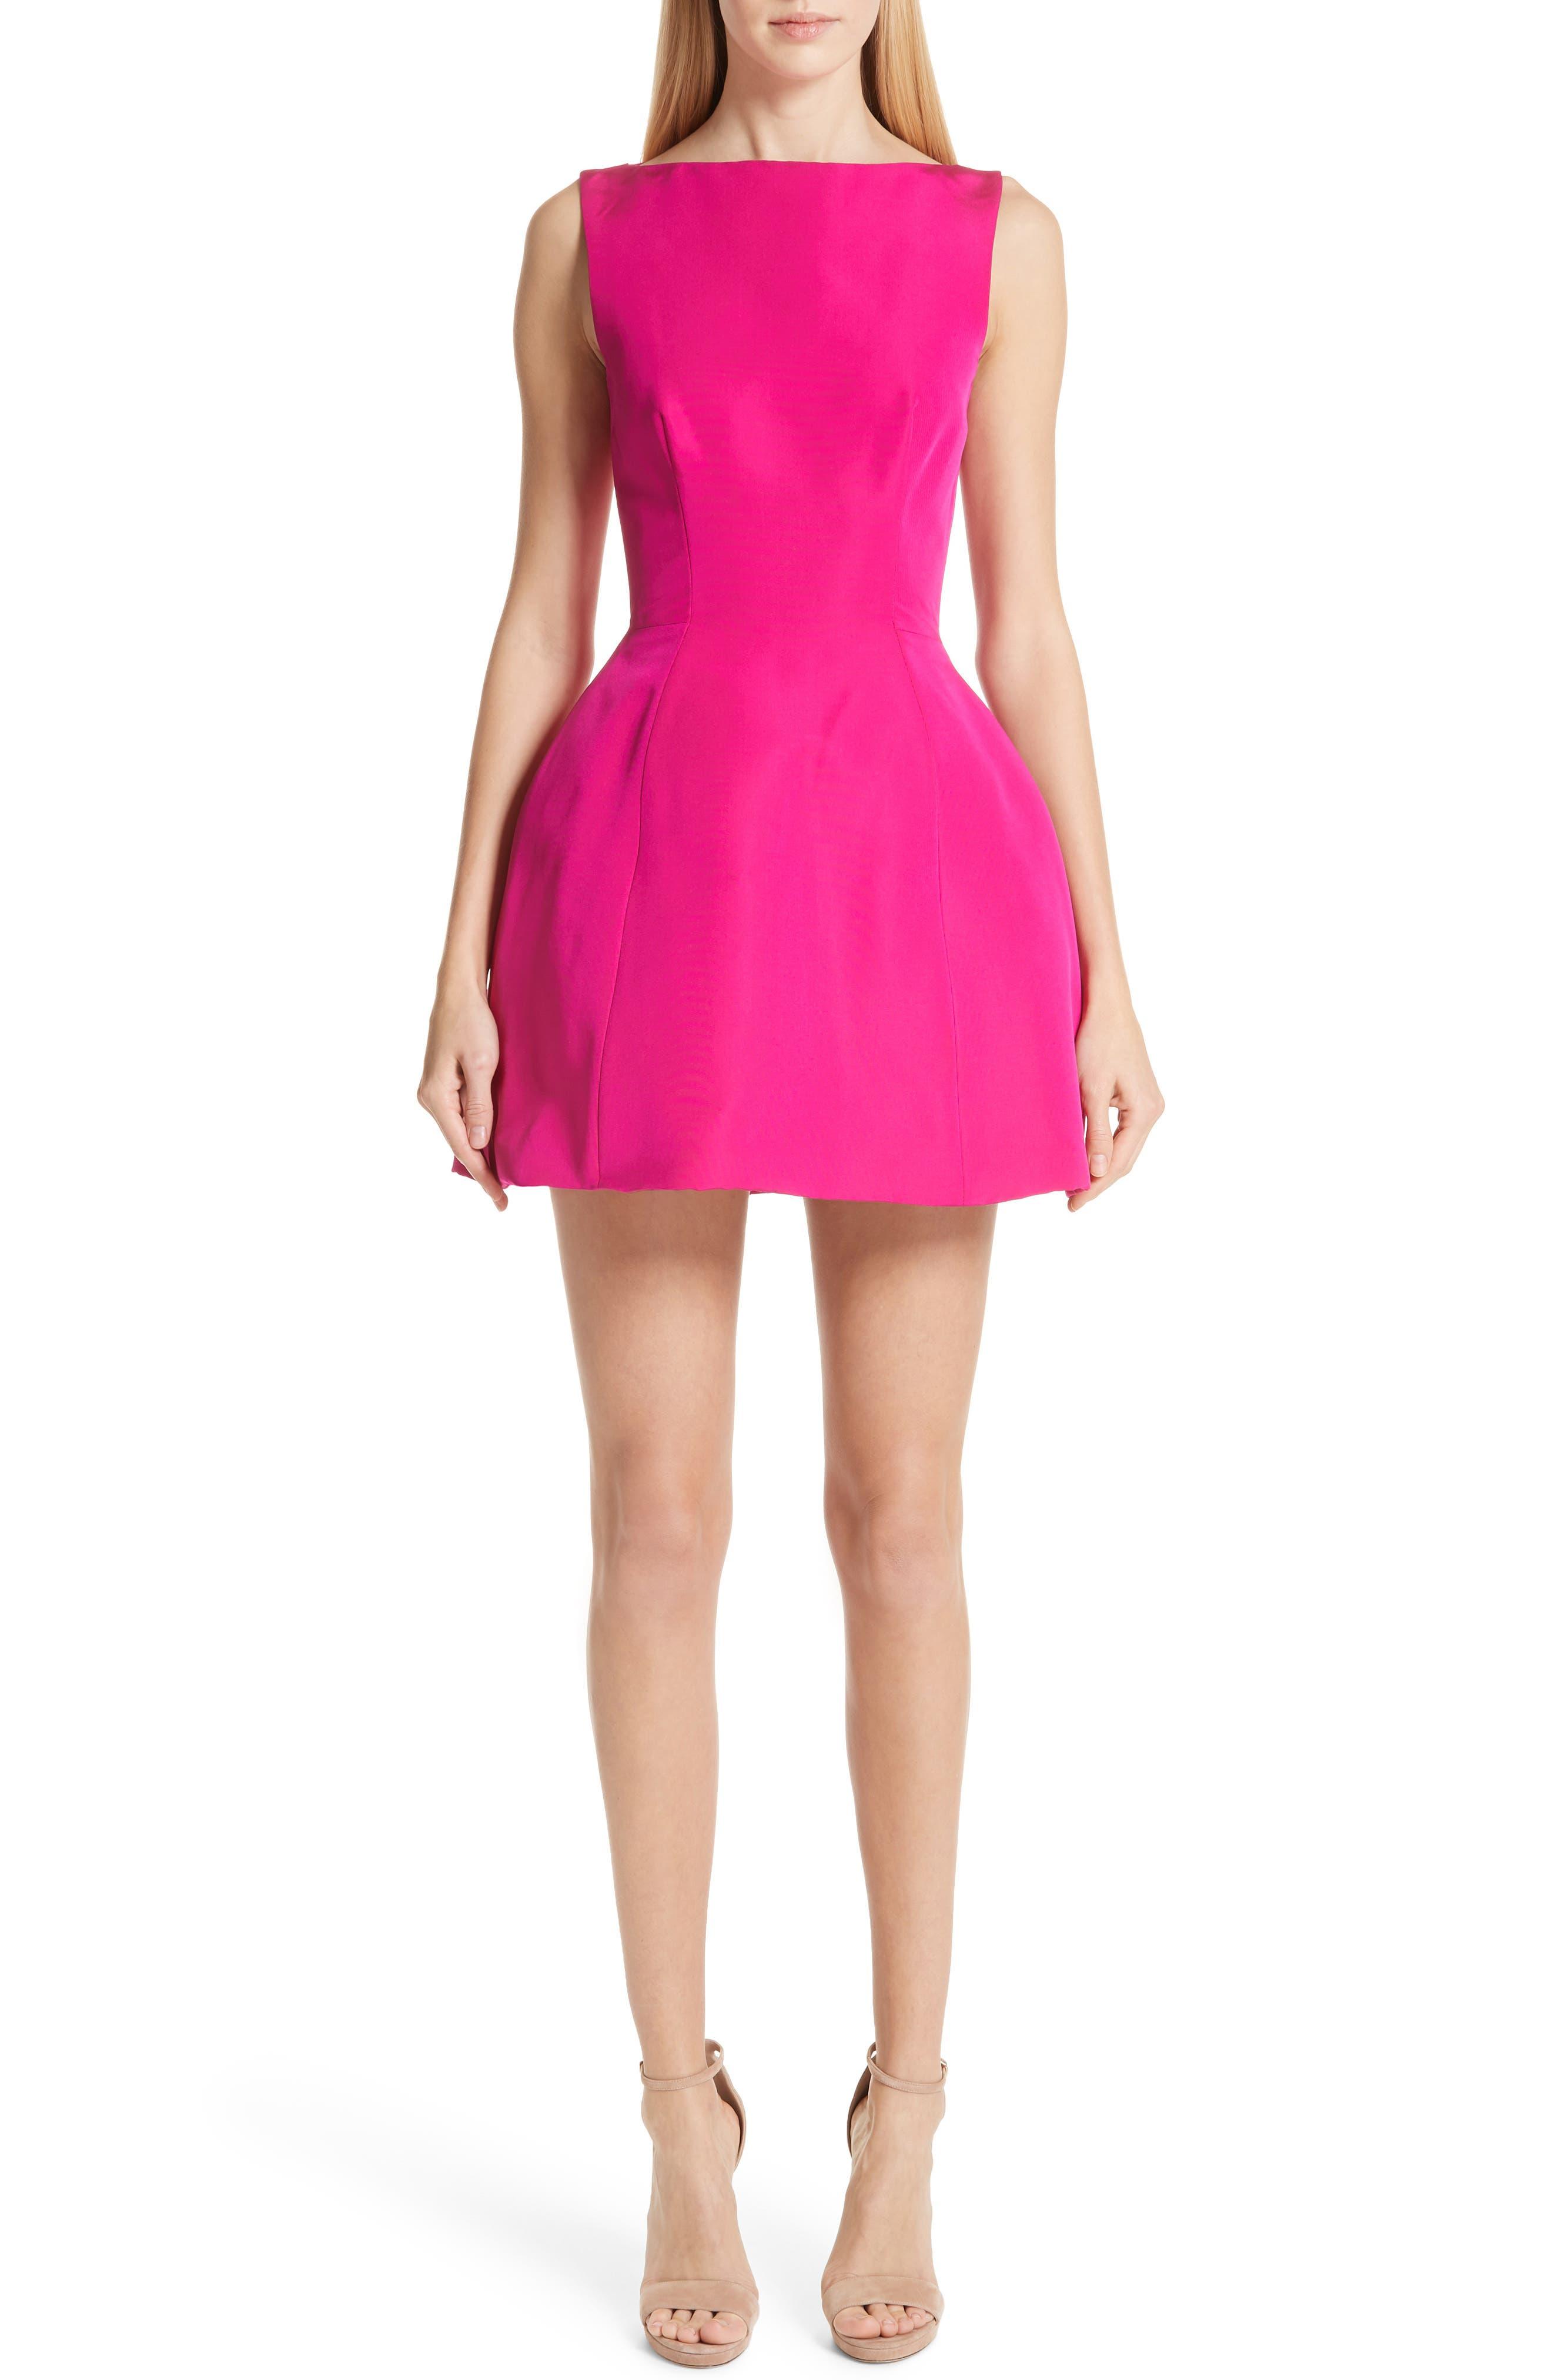 BRANDON MAXWELL Sleeveless Fit-And-Flare Silk Faille Bubble Dress in Fuchsia